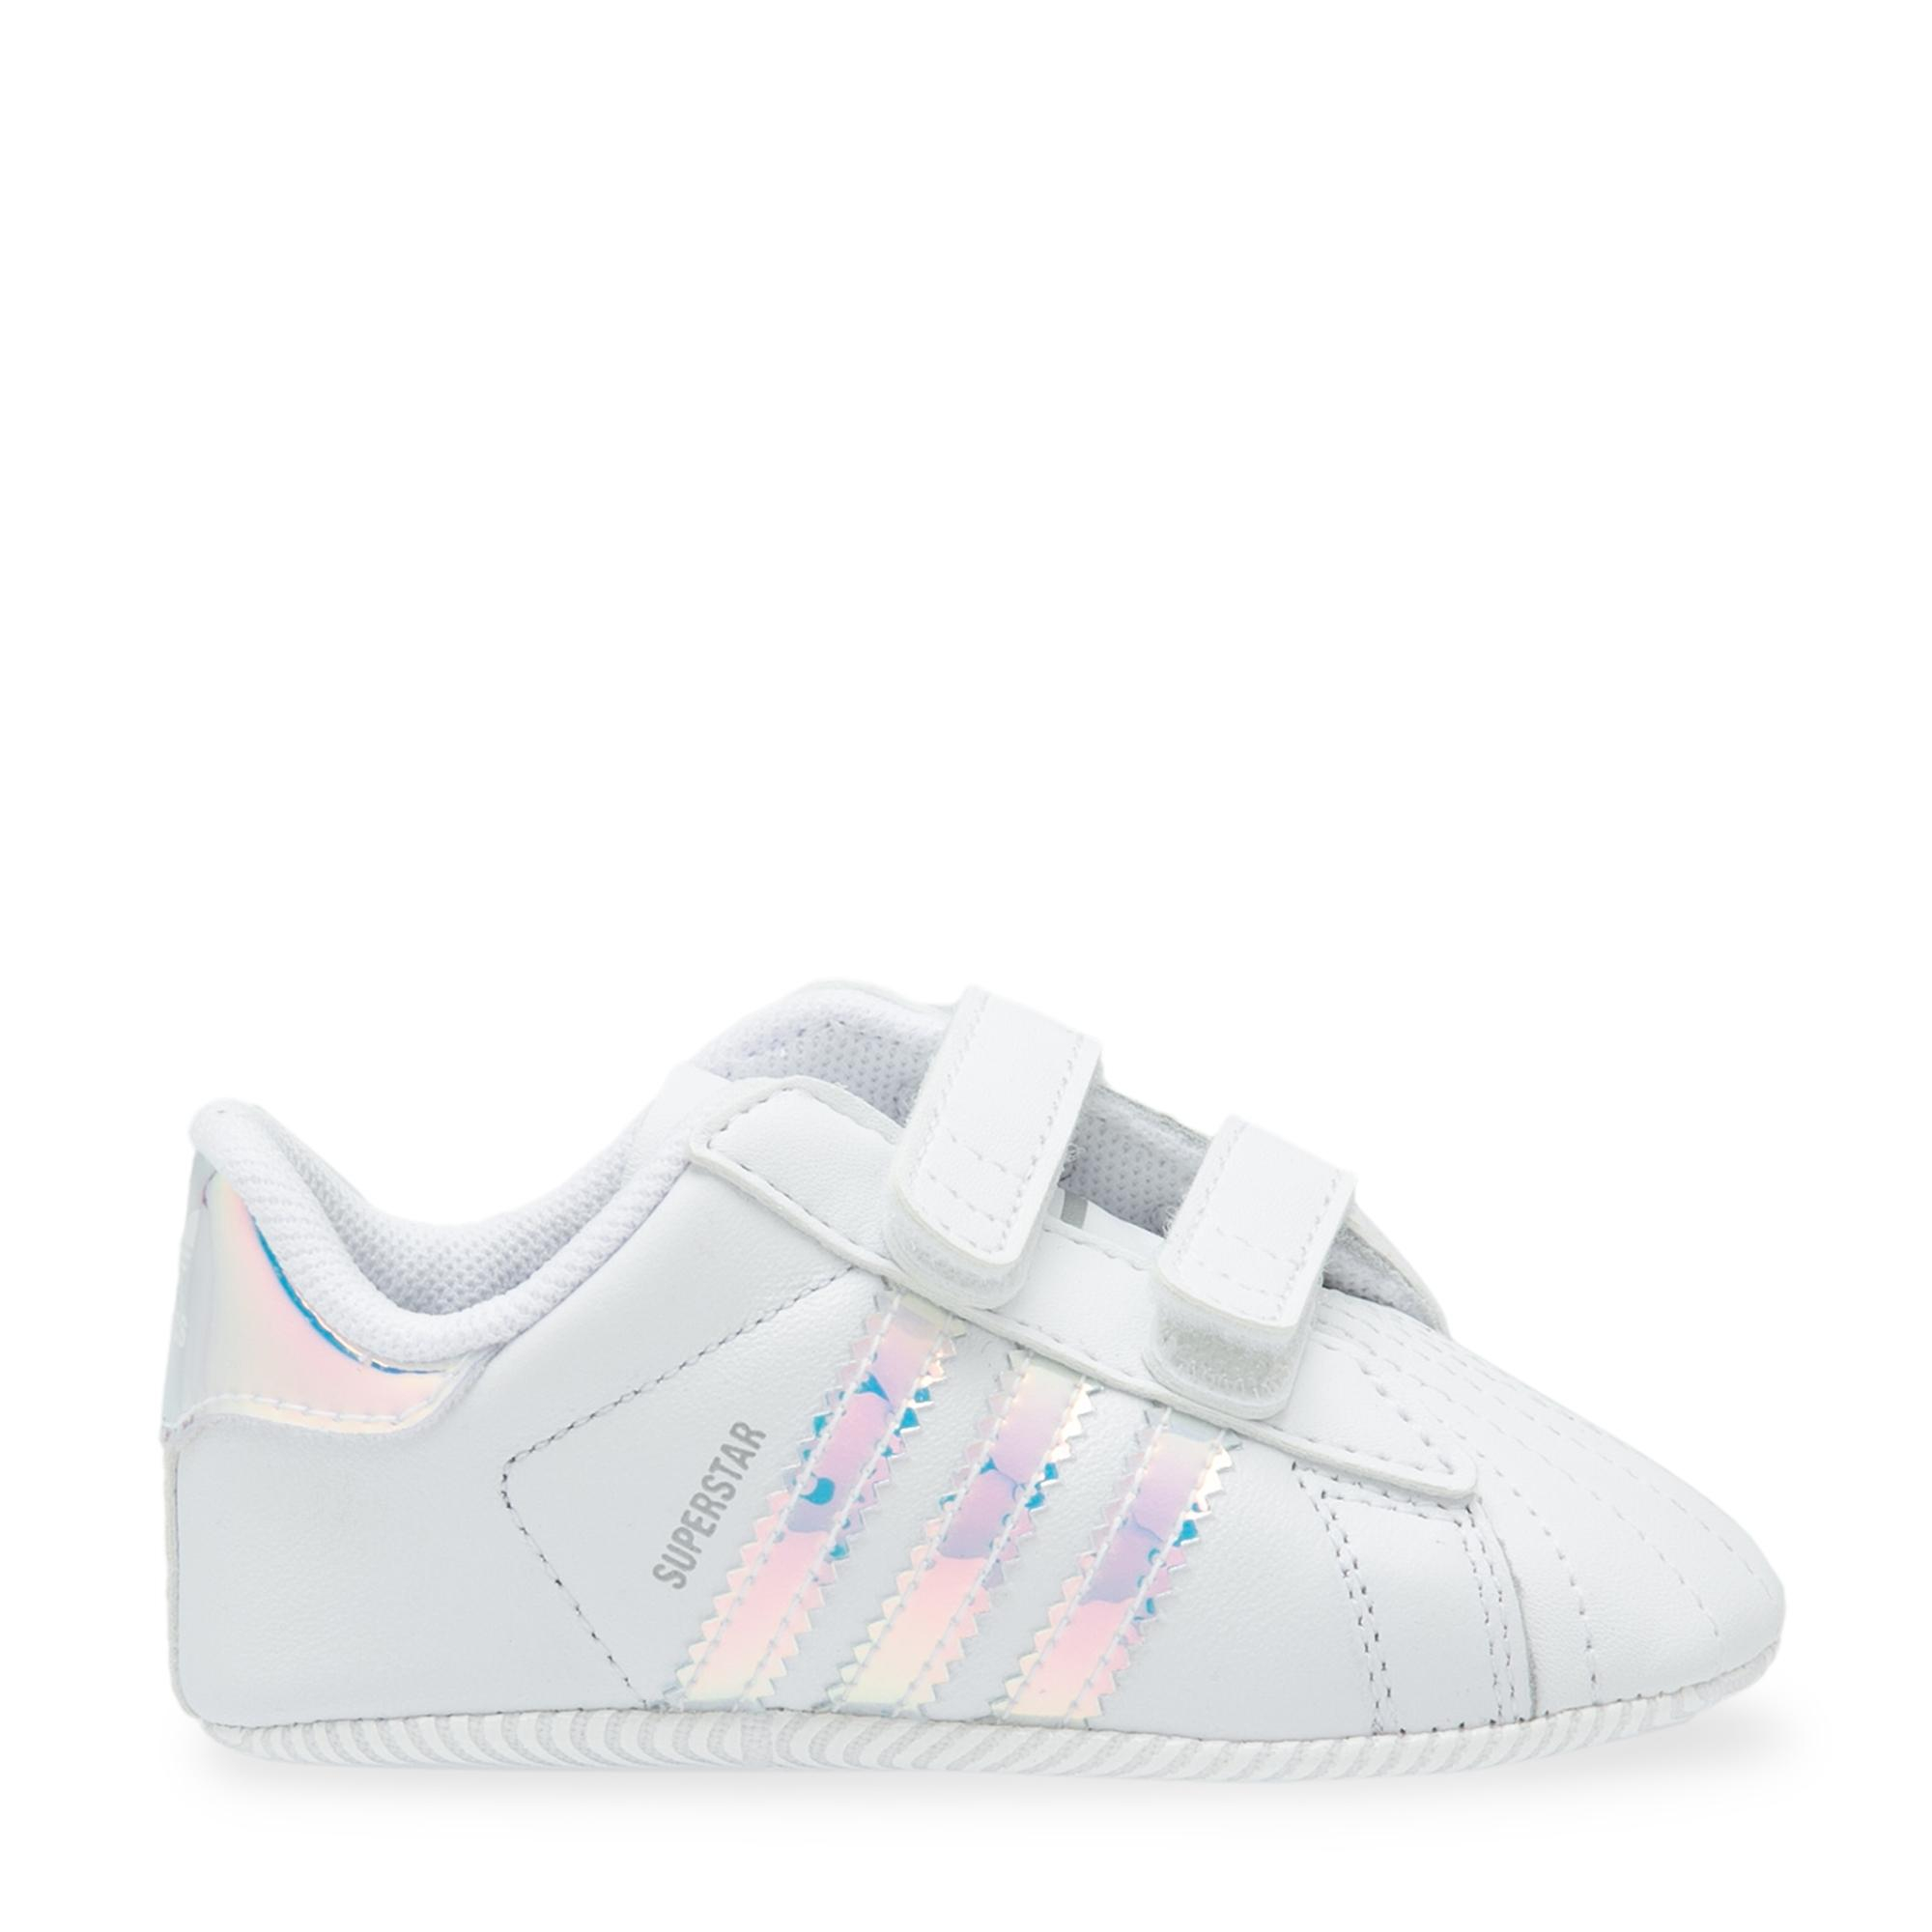 Superstar crib shoes